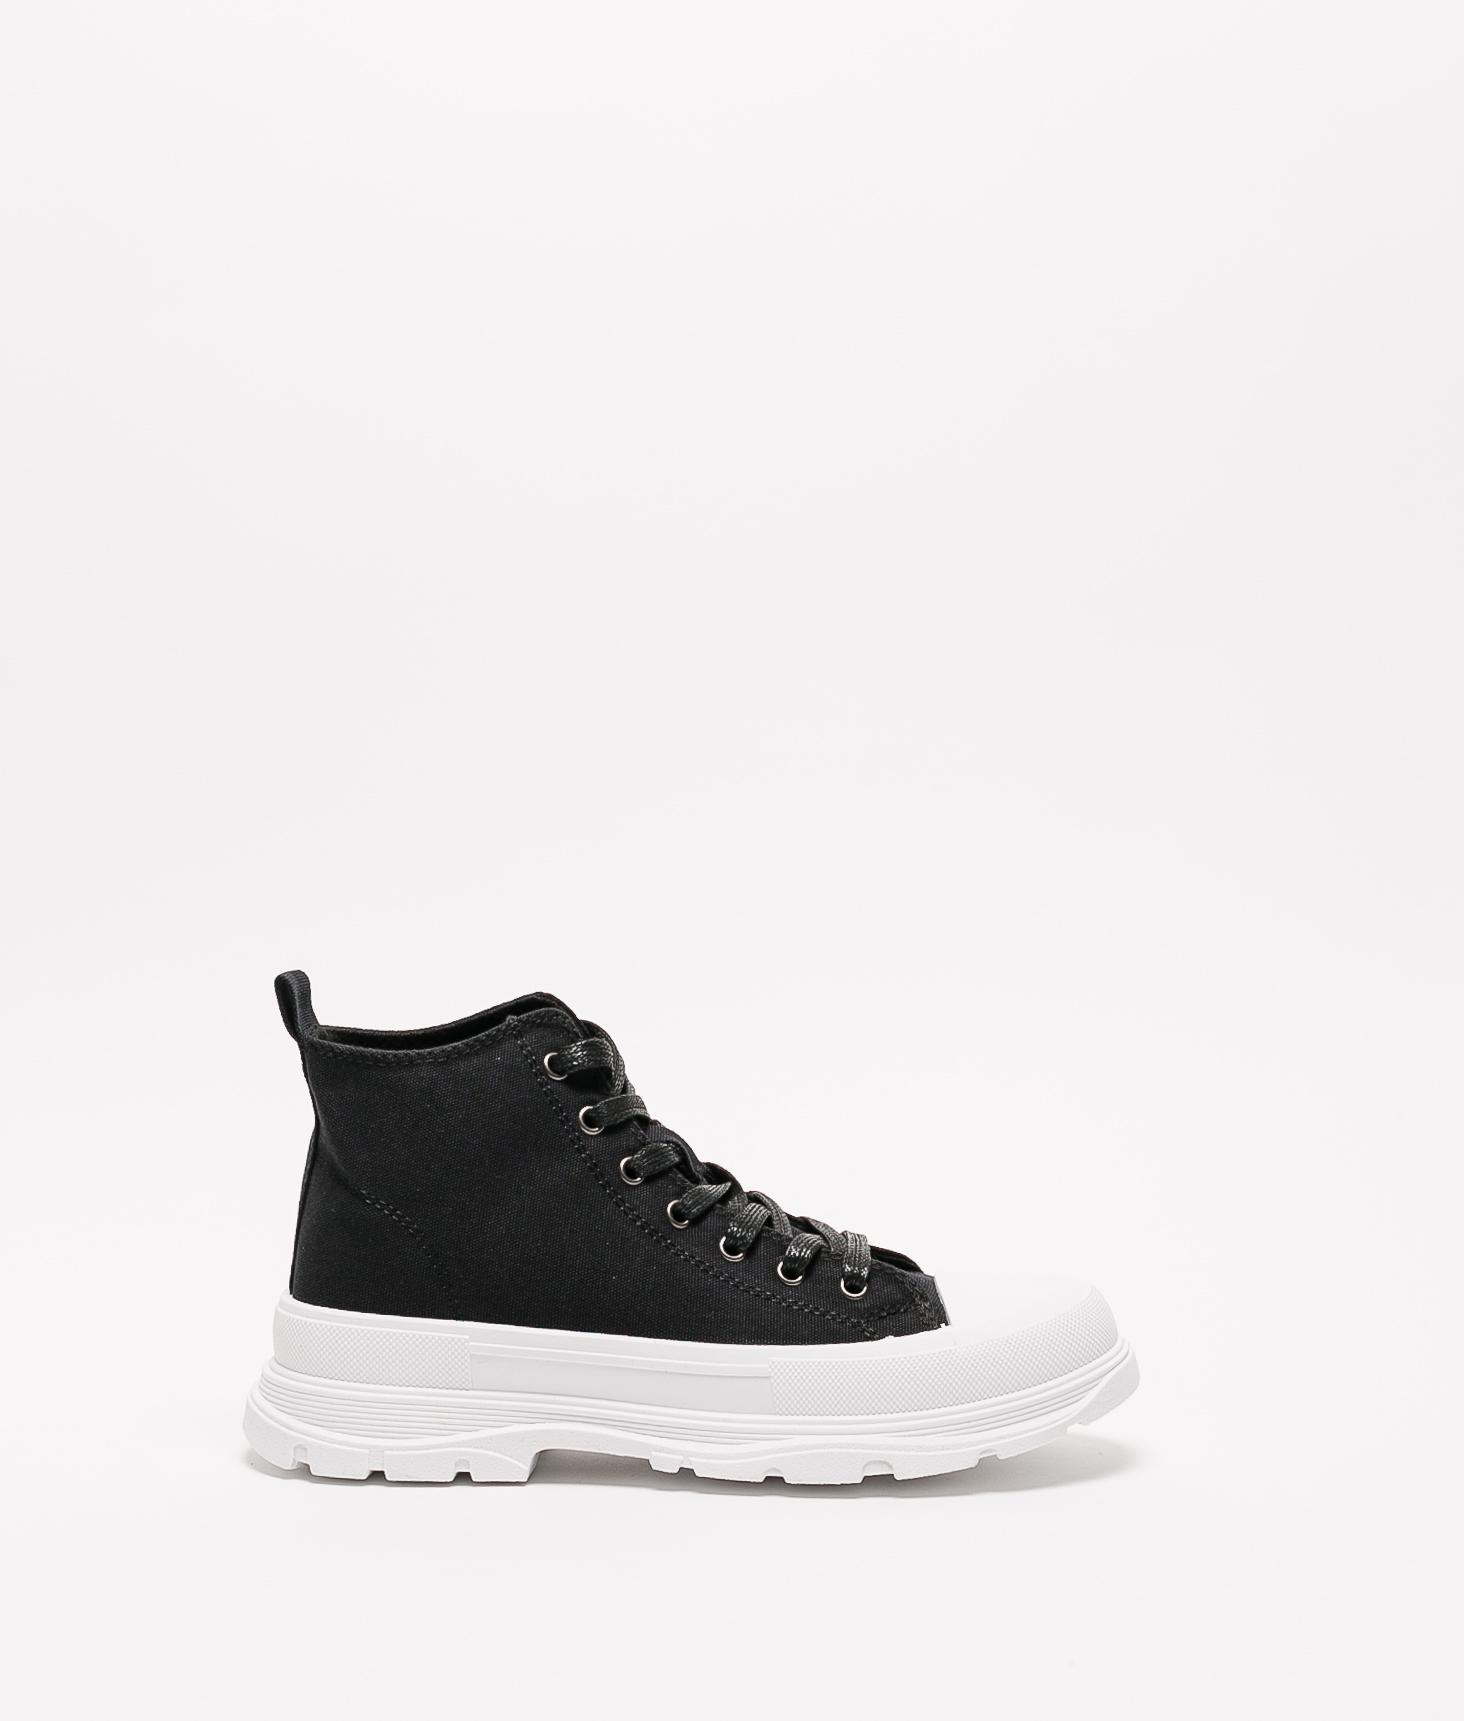 Sneakers Lenui - Blanc/Noir